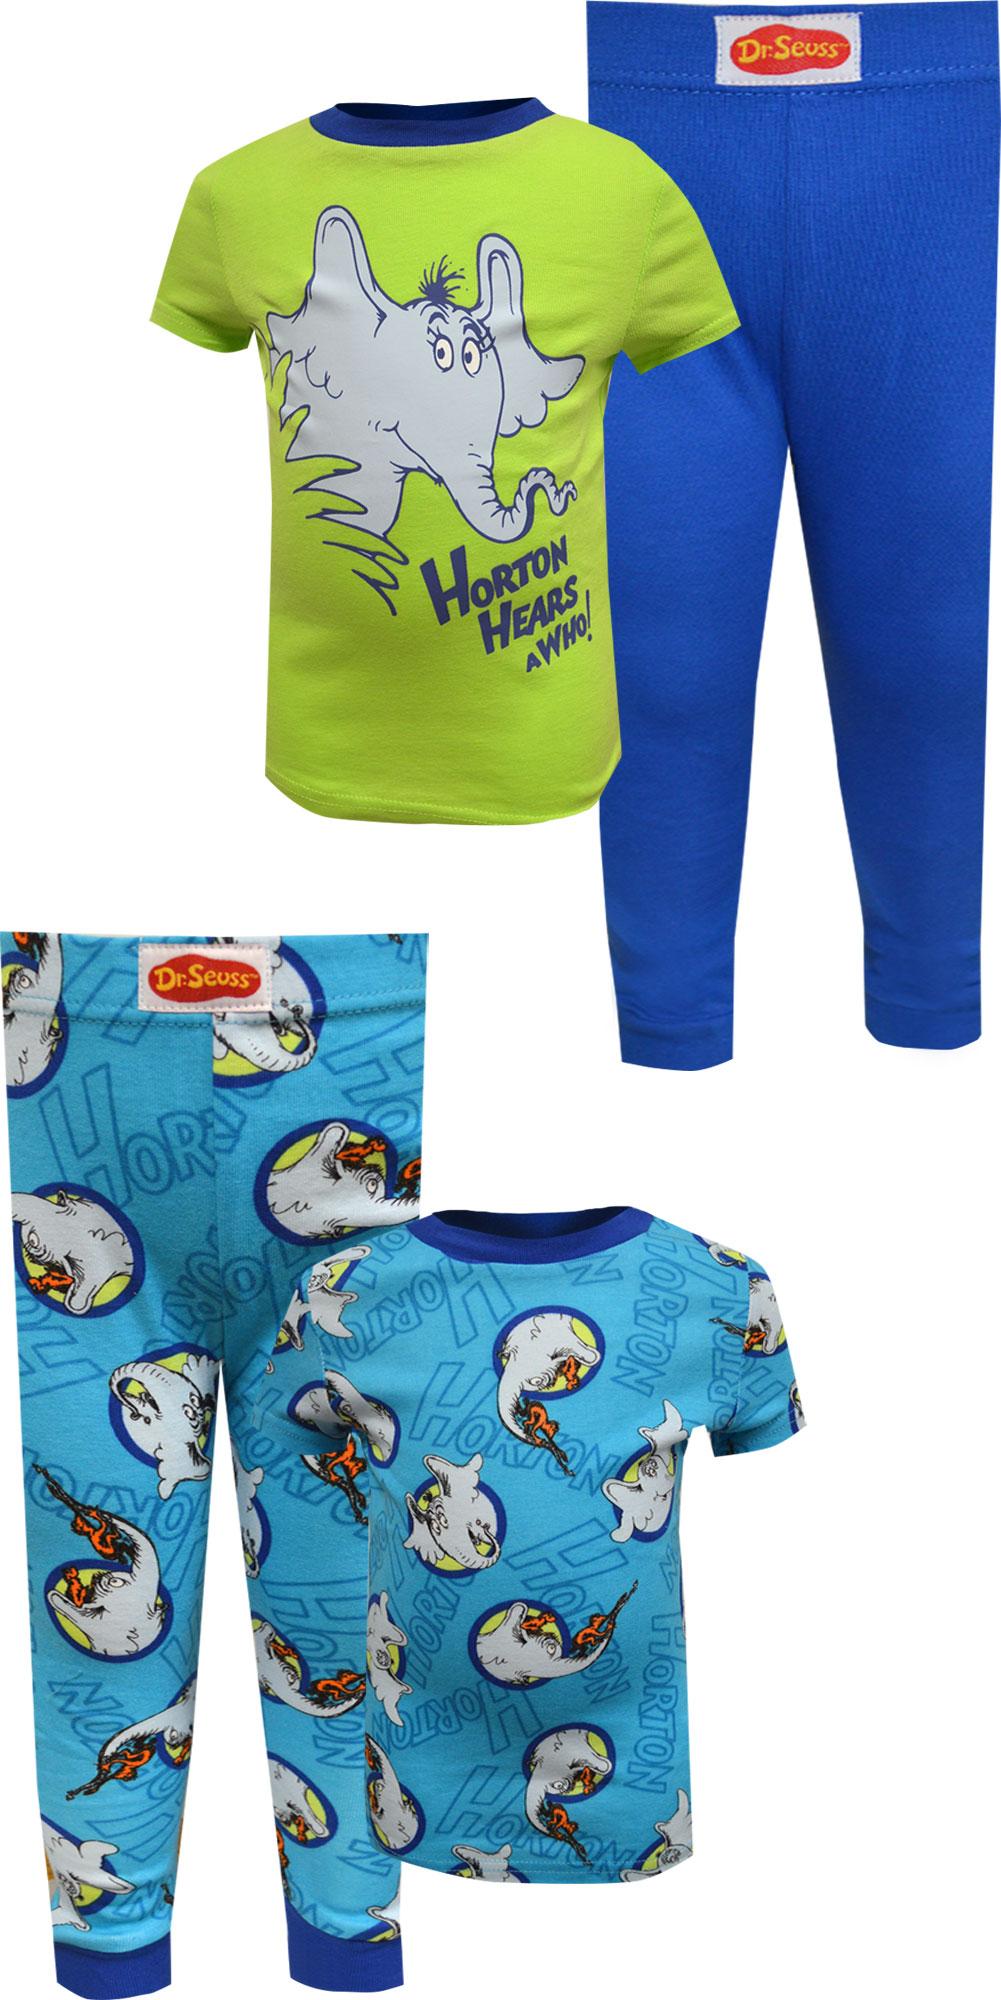 Image of Dr Seuss Horton Hears A Who Boys Infant 4 Piece Pajamas for boys